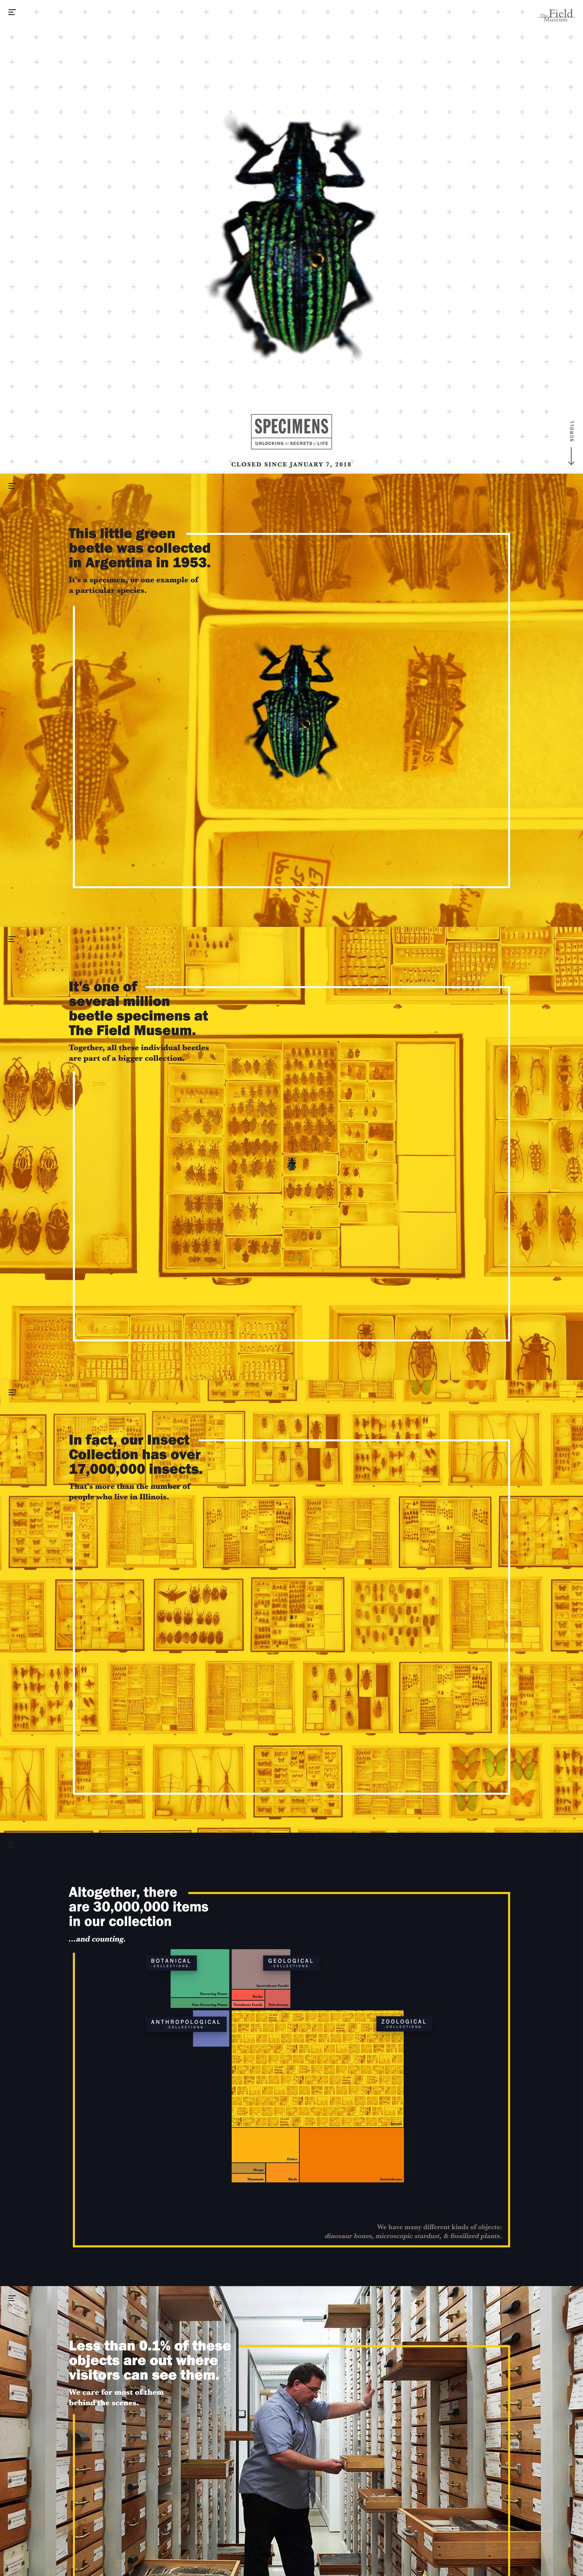 Specimens – The Field Museum Website Screenshot